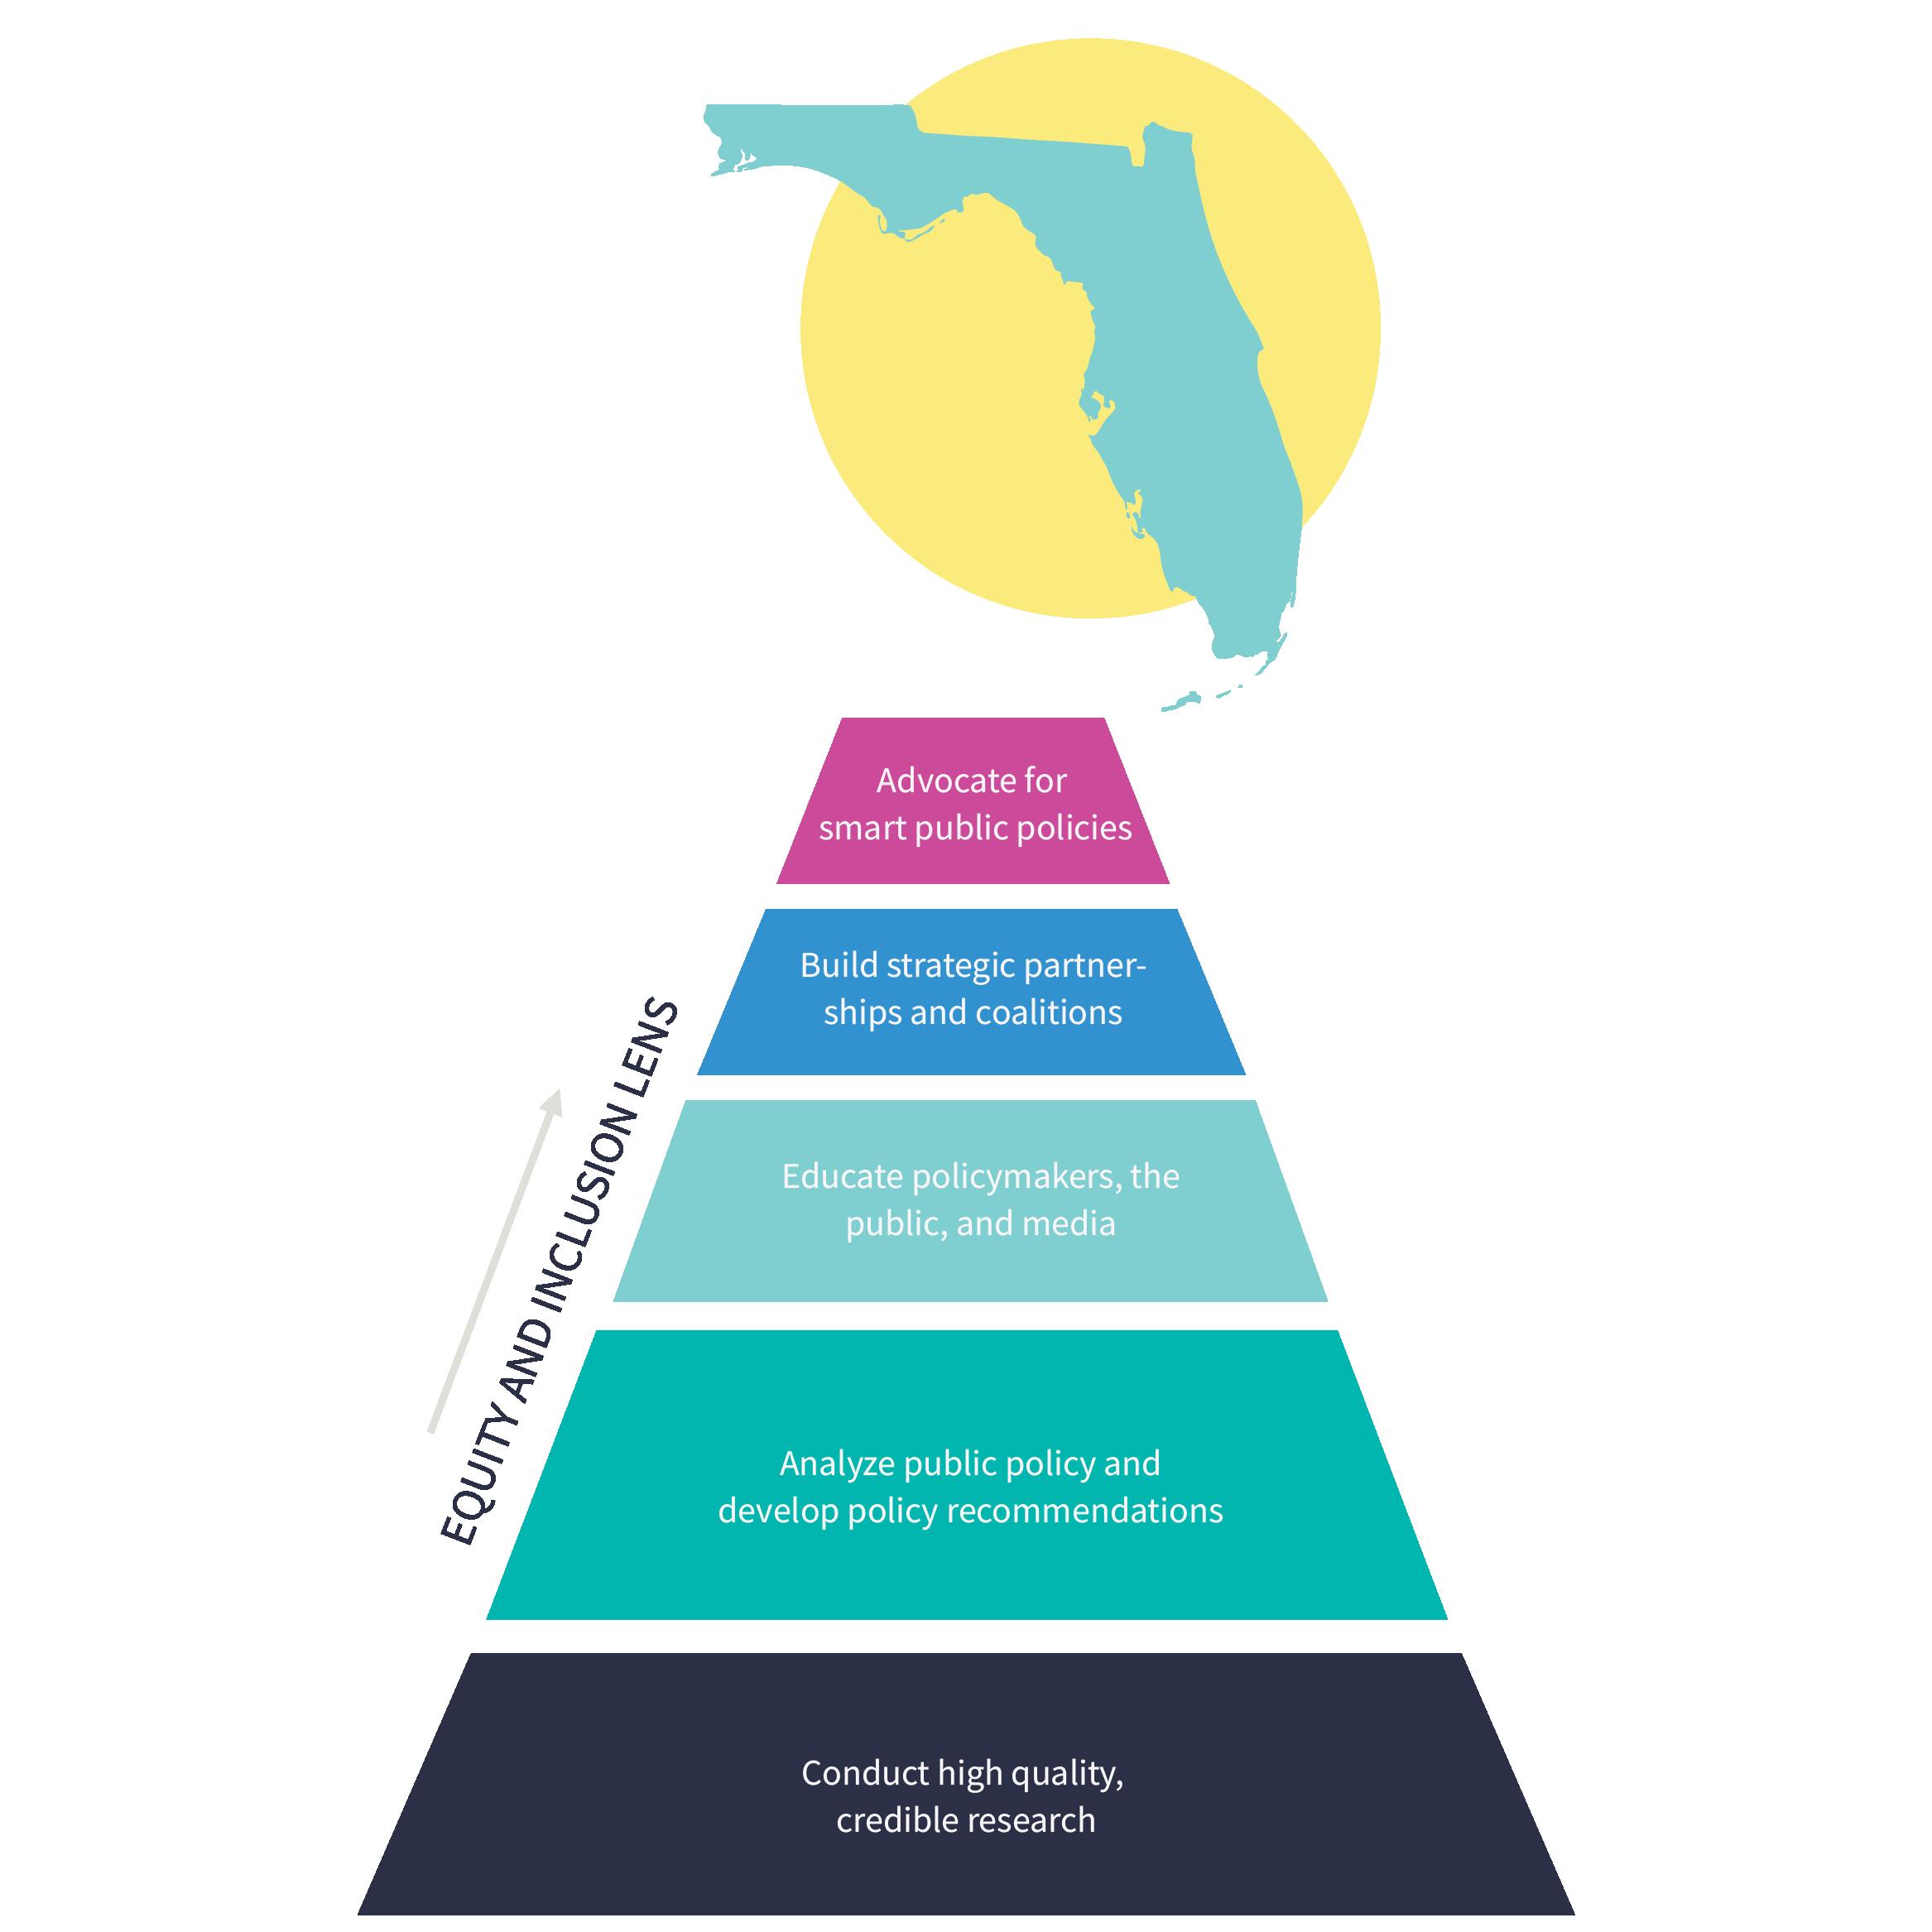 FPI pyramid diagram